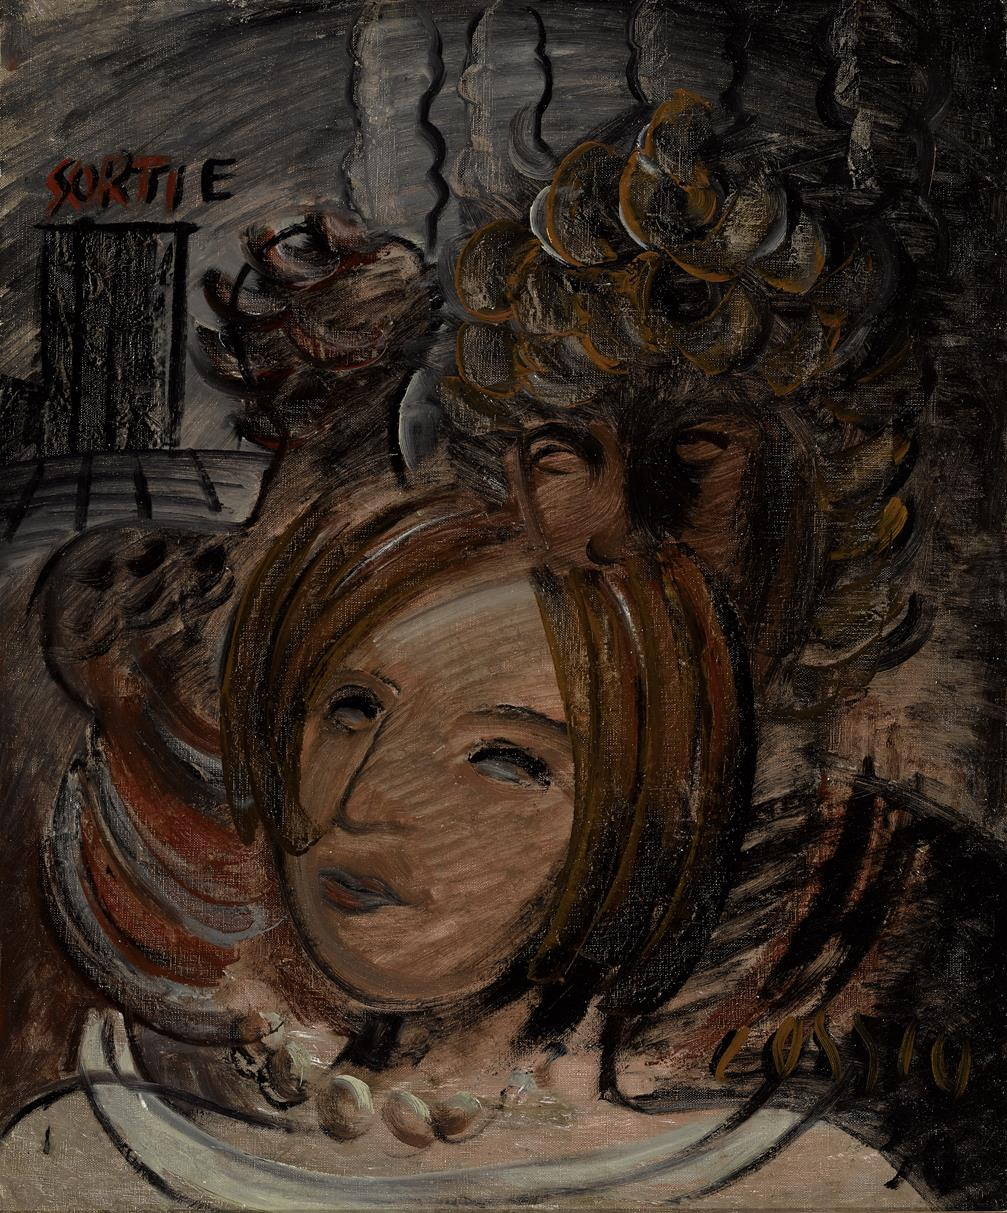 Cabeza de mujer (2020) - Pancho Cossío